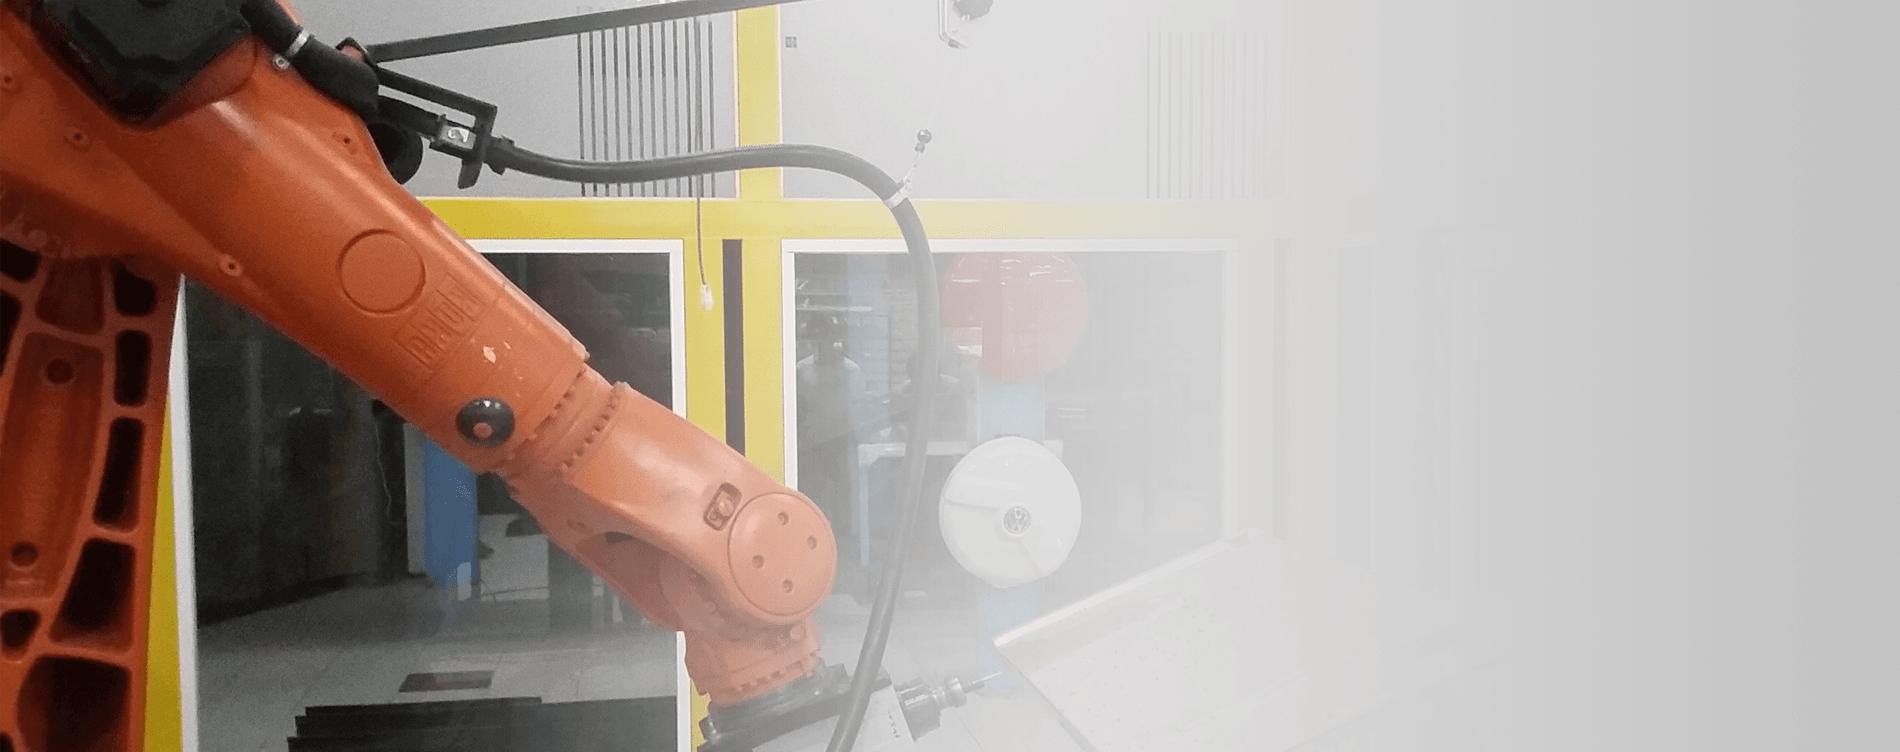 Robotic Integration Amp Industrial Control Systems Phoenix